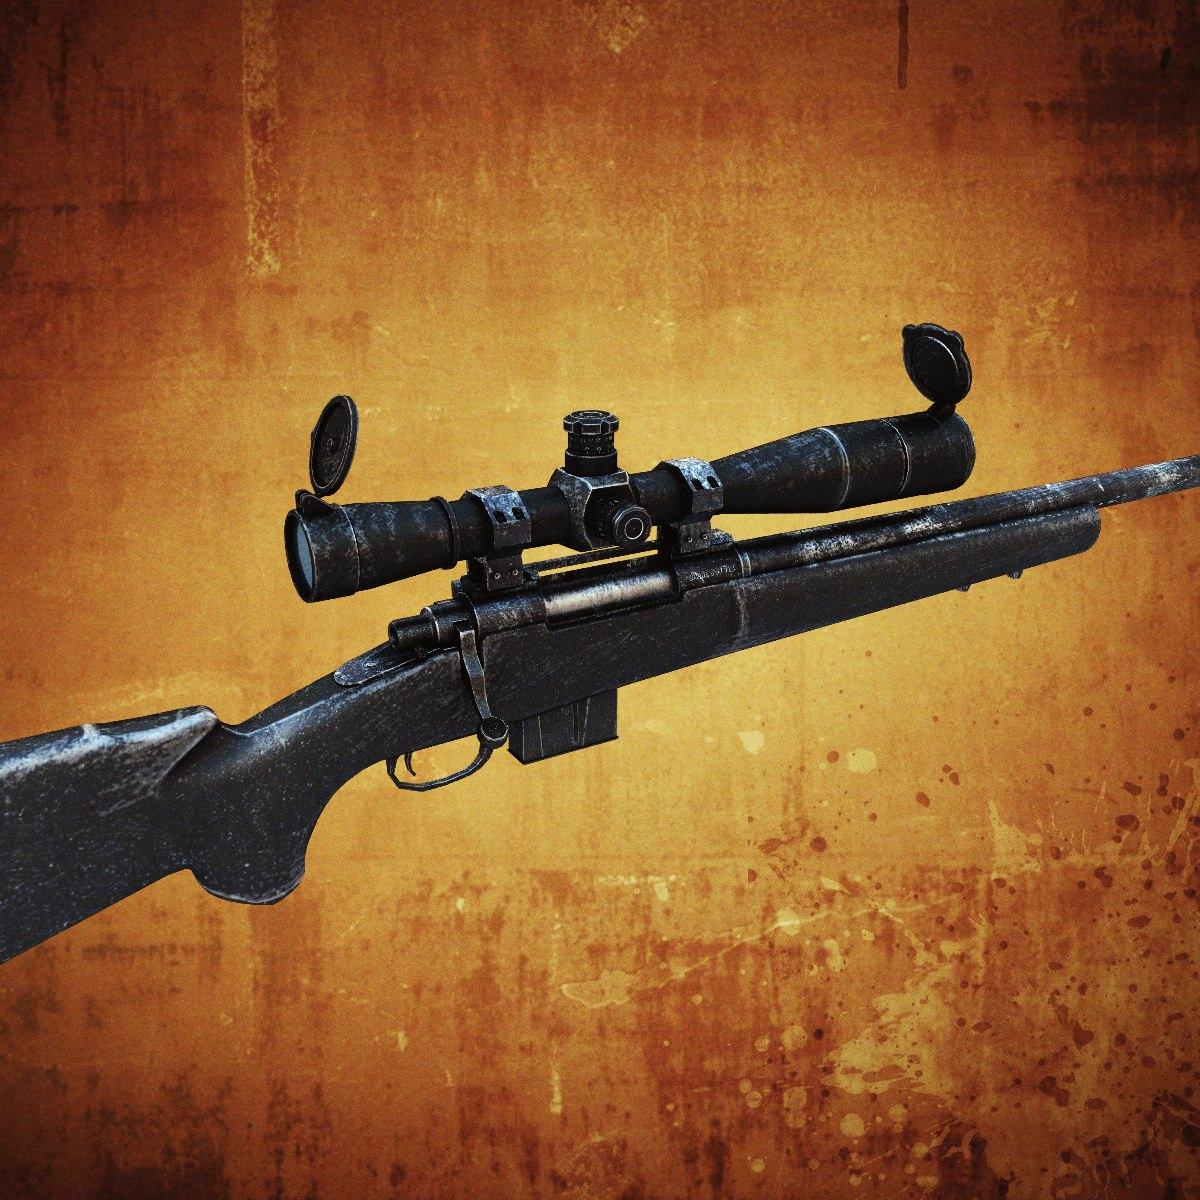 m24a2 sniper rifle - photo #8